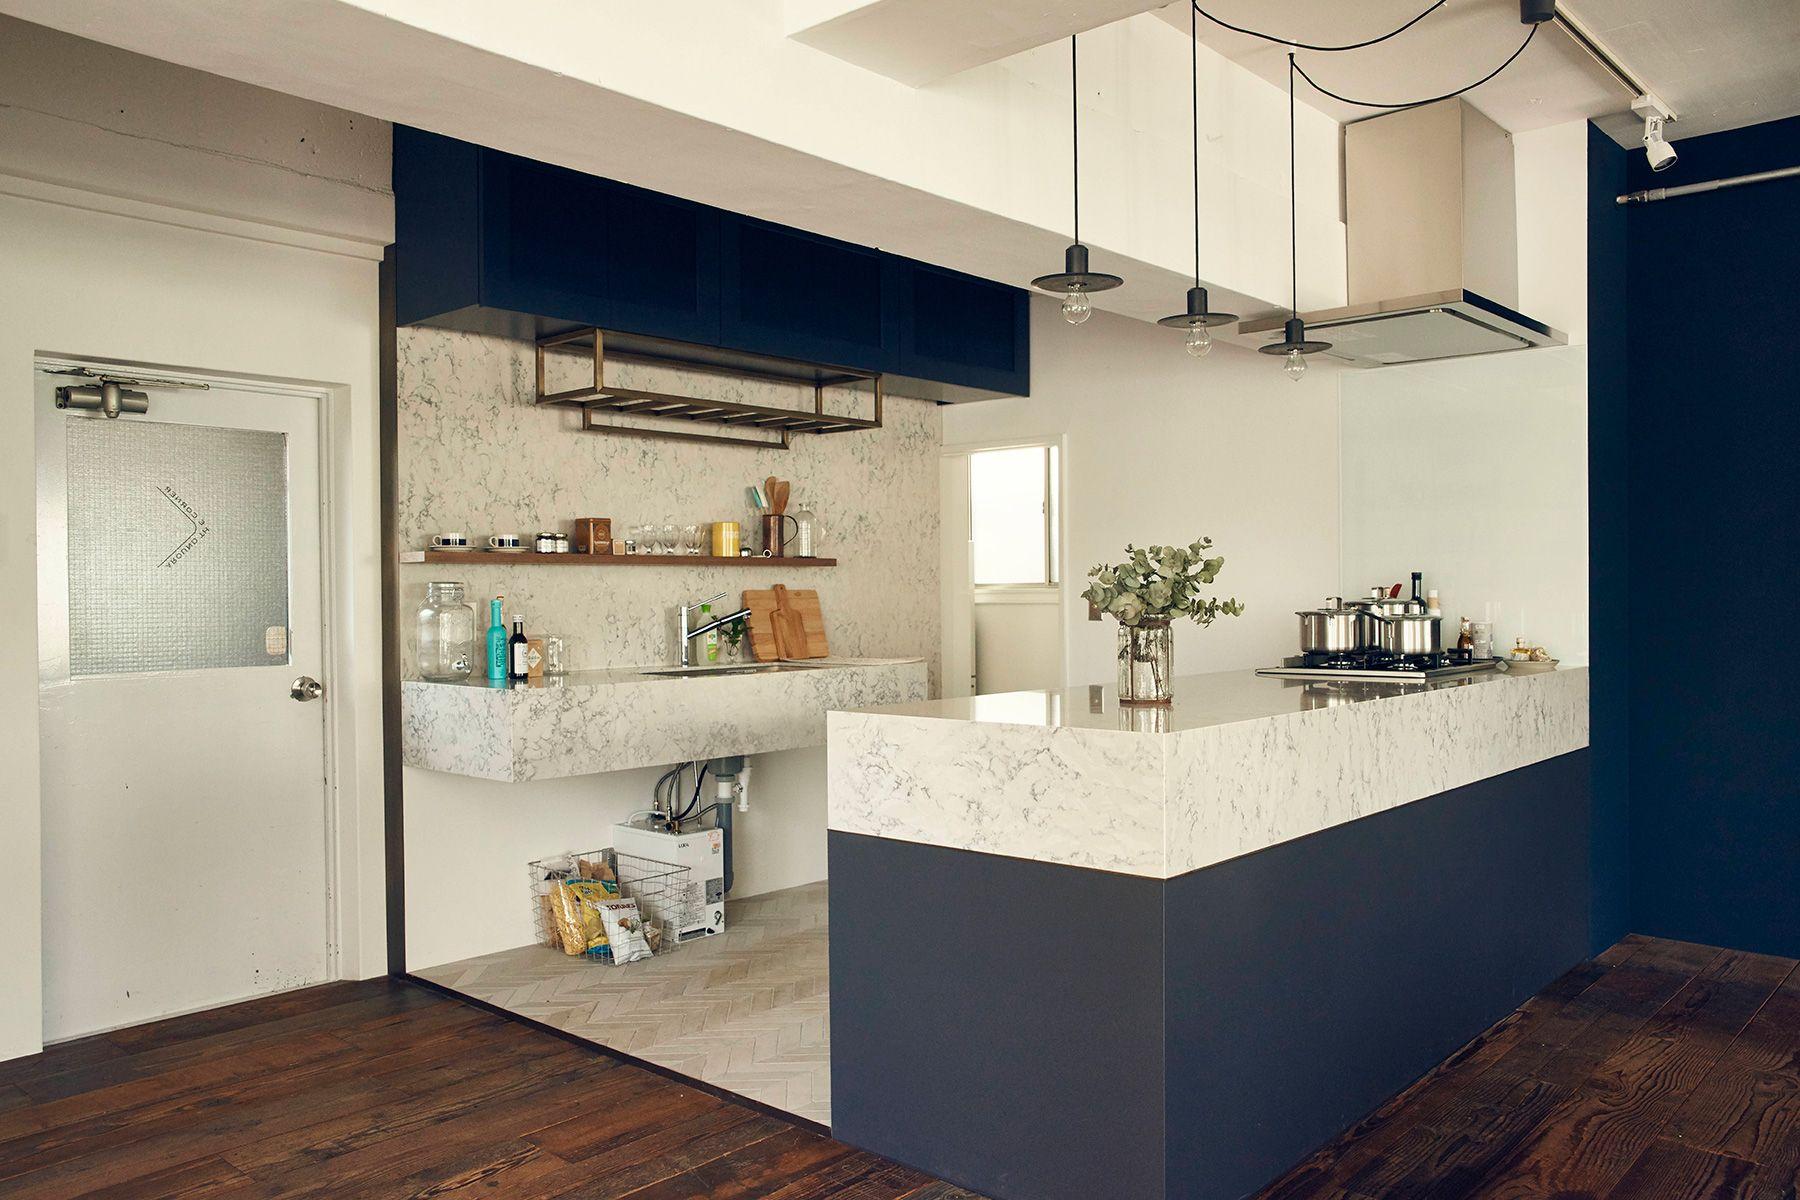 AROUND THE CORNER (アラウンド ザ コーナー)動きやすい配置のキッチン